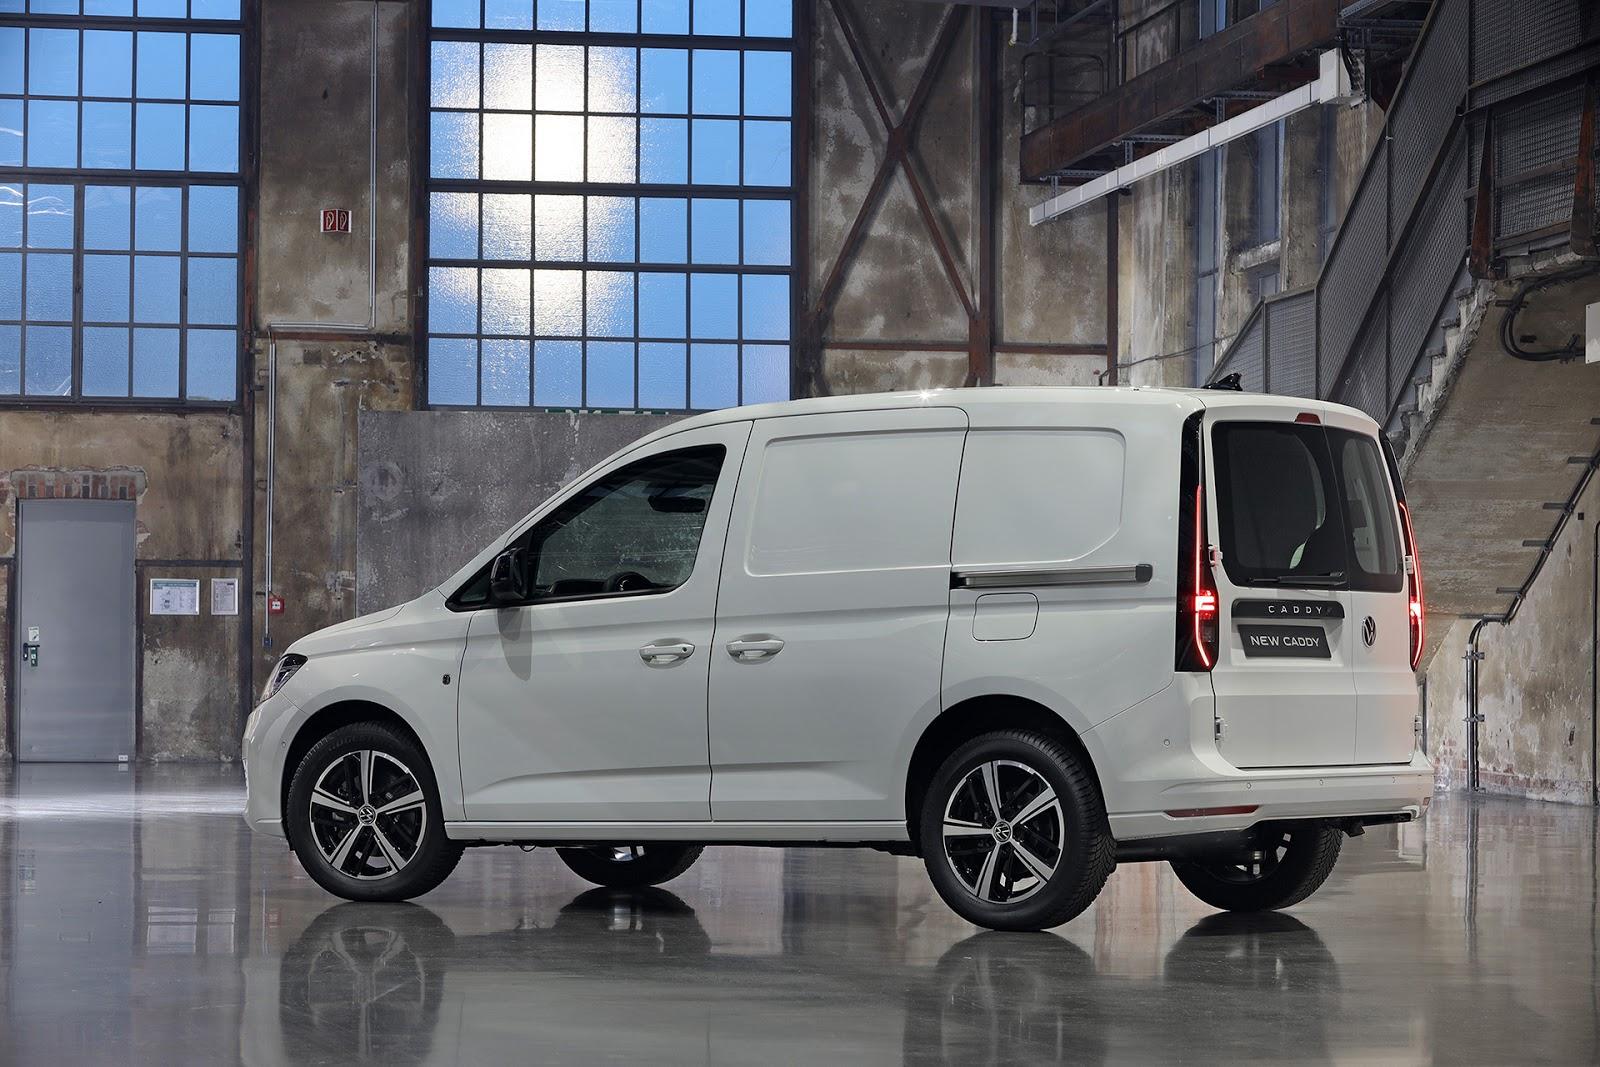 NEO2BVOLKSWAGEN2BCADDY2B5 2 1 Νέο Volkswagen Caddy 5: μεγαλύτερο, πρακτικότερο, αποδοτικότερο, εξυπνότερο Caddy, MPV, Volkswagen, Volkswagen Caddy, VW, VW Caddy, ειδήσεις, Επαγγελματικά